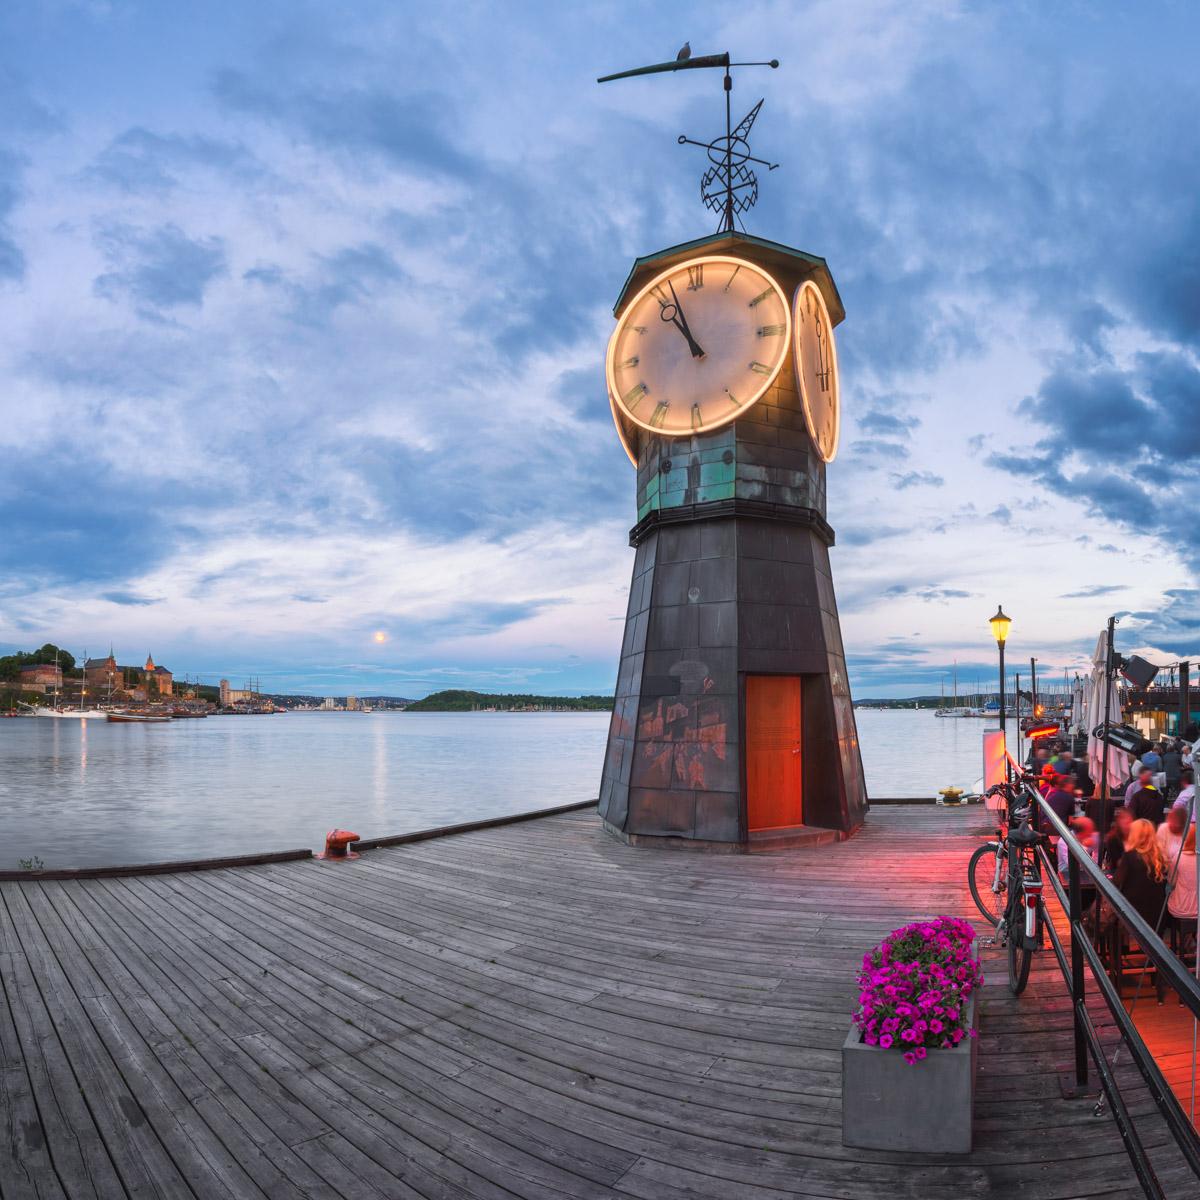 Clock Tower at Aker Brygge, Oslo, Norway